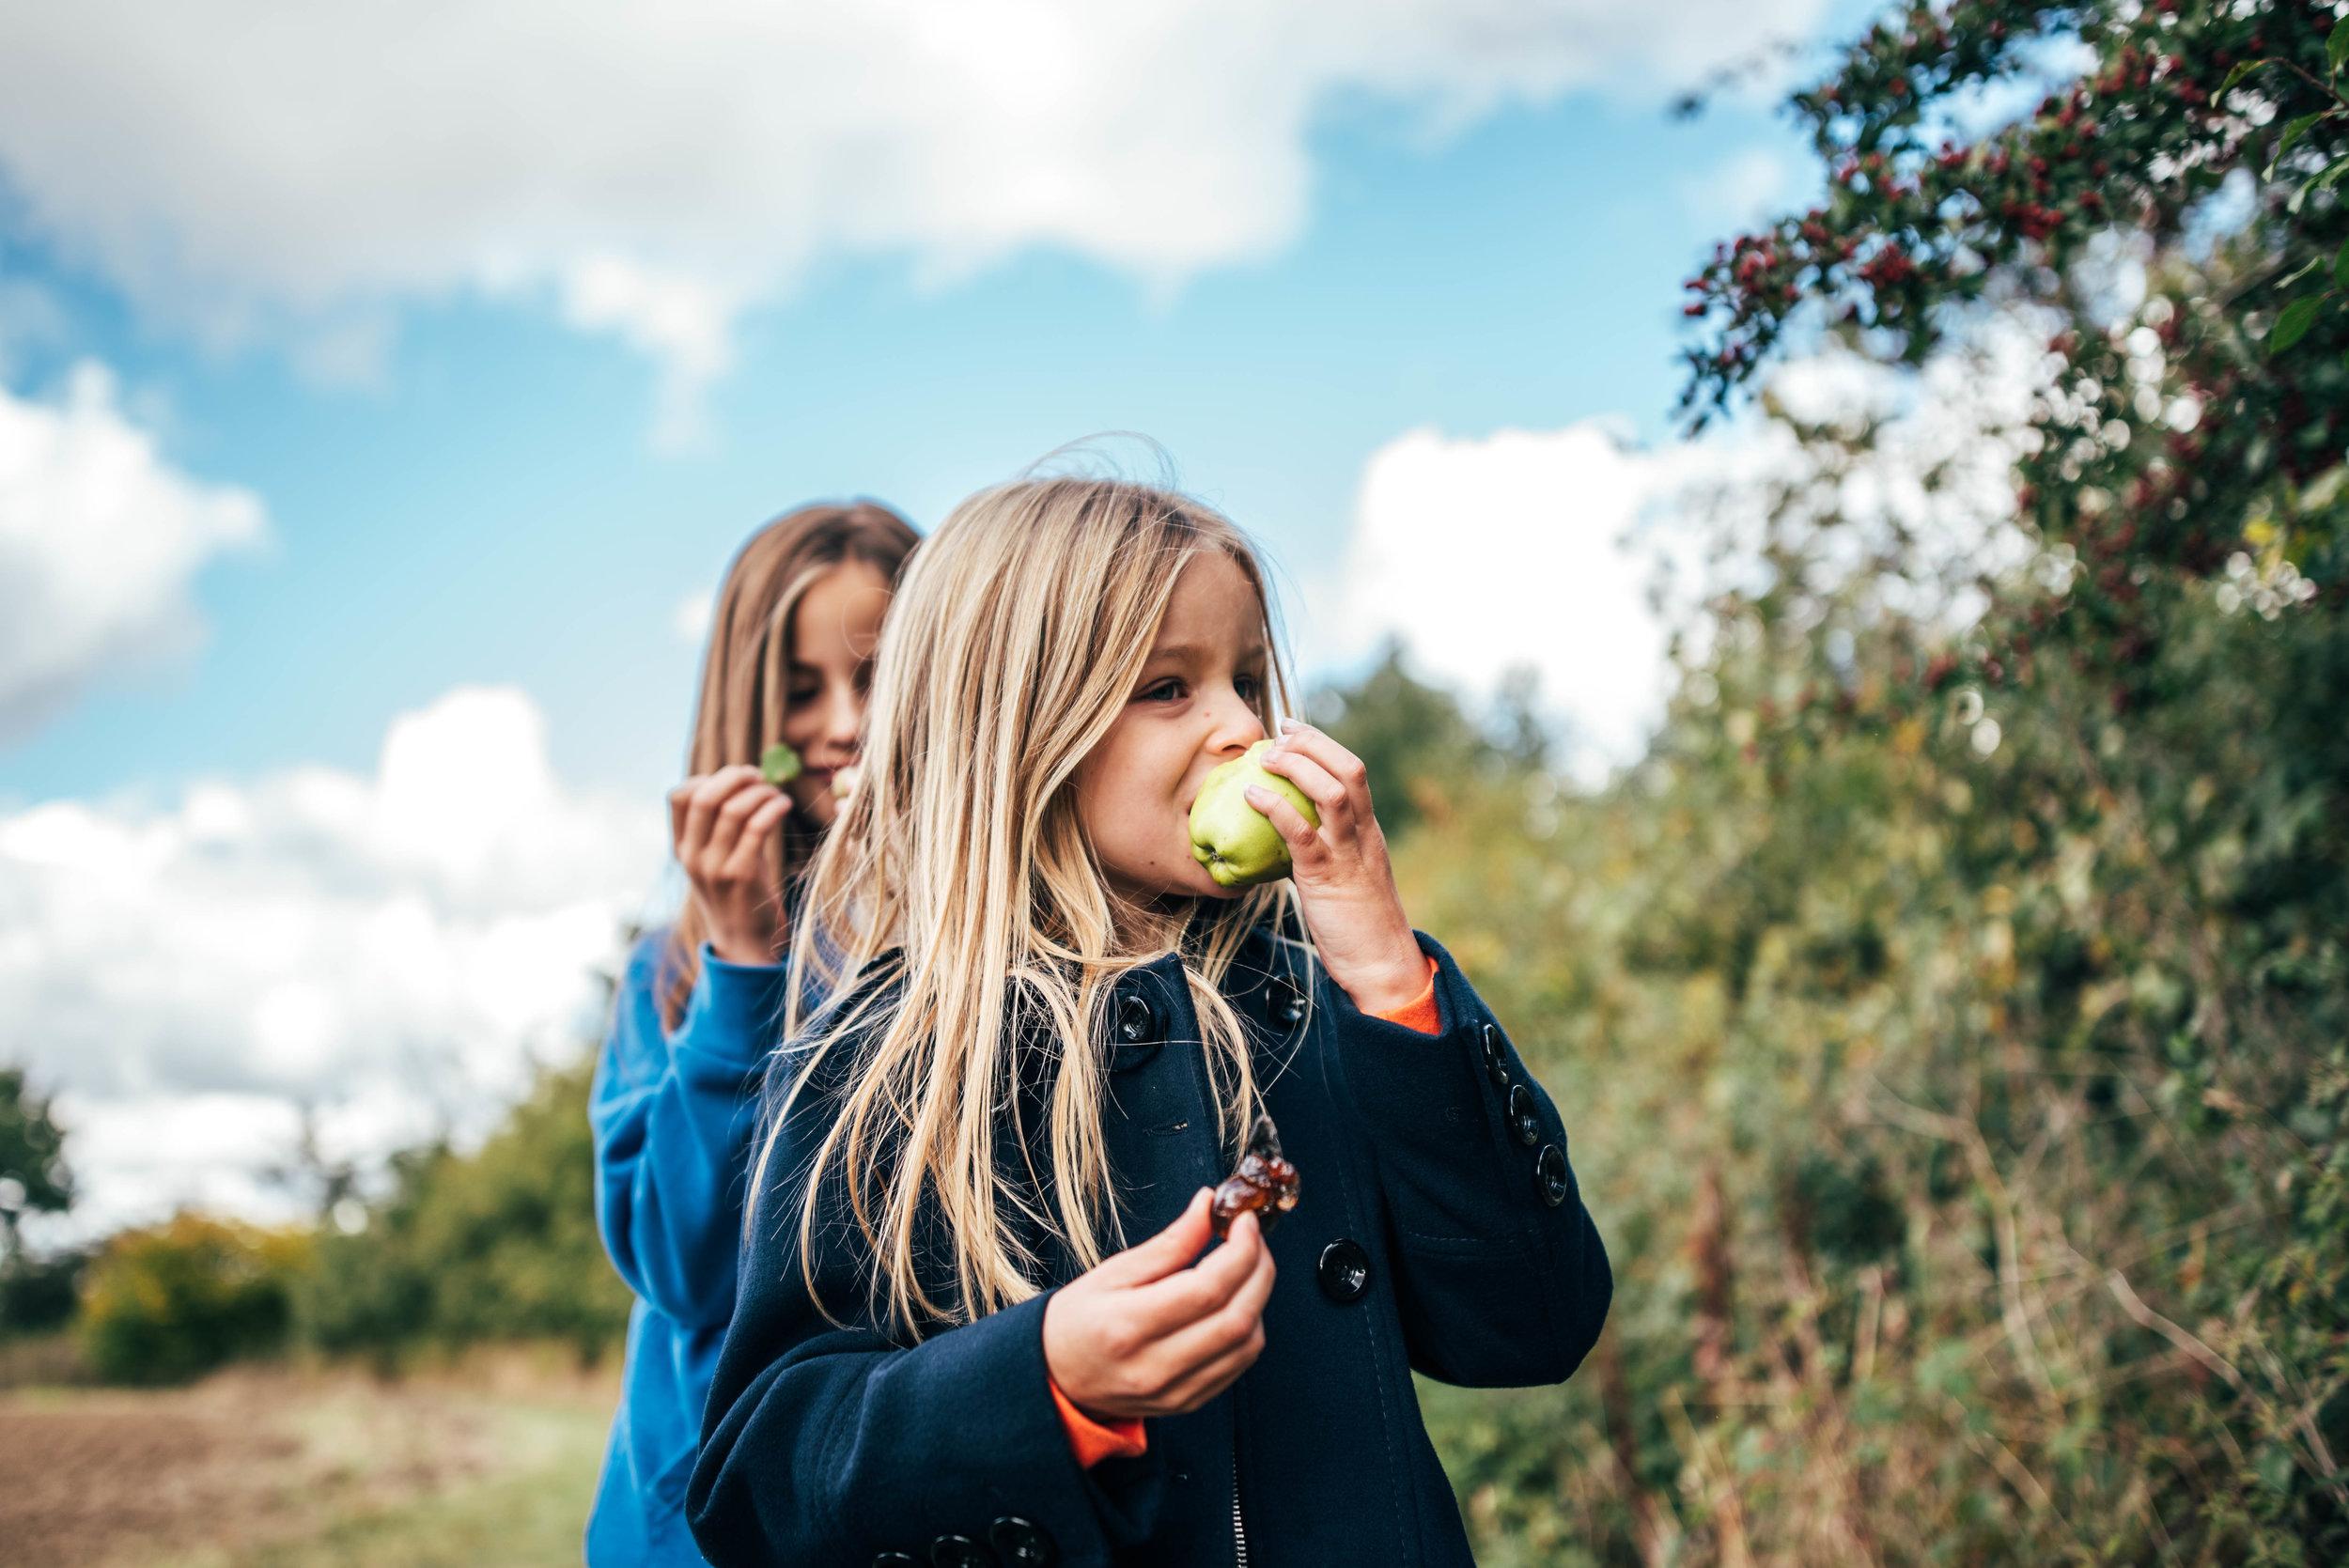 Girls eat apples Essex UK Documentary Portrait Photographer